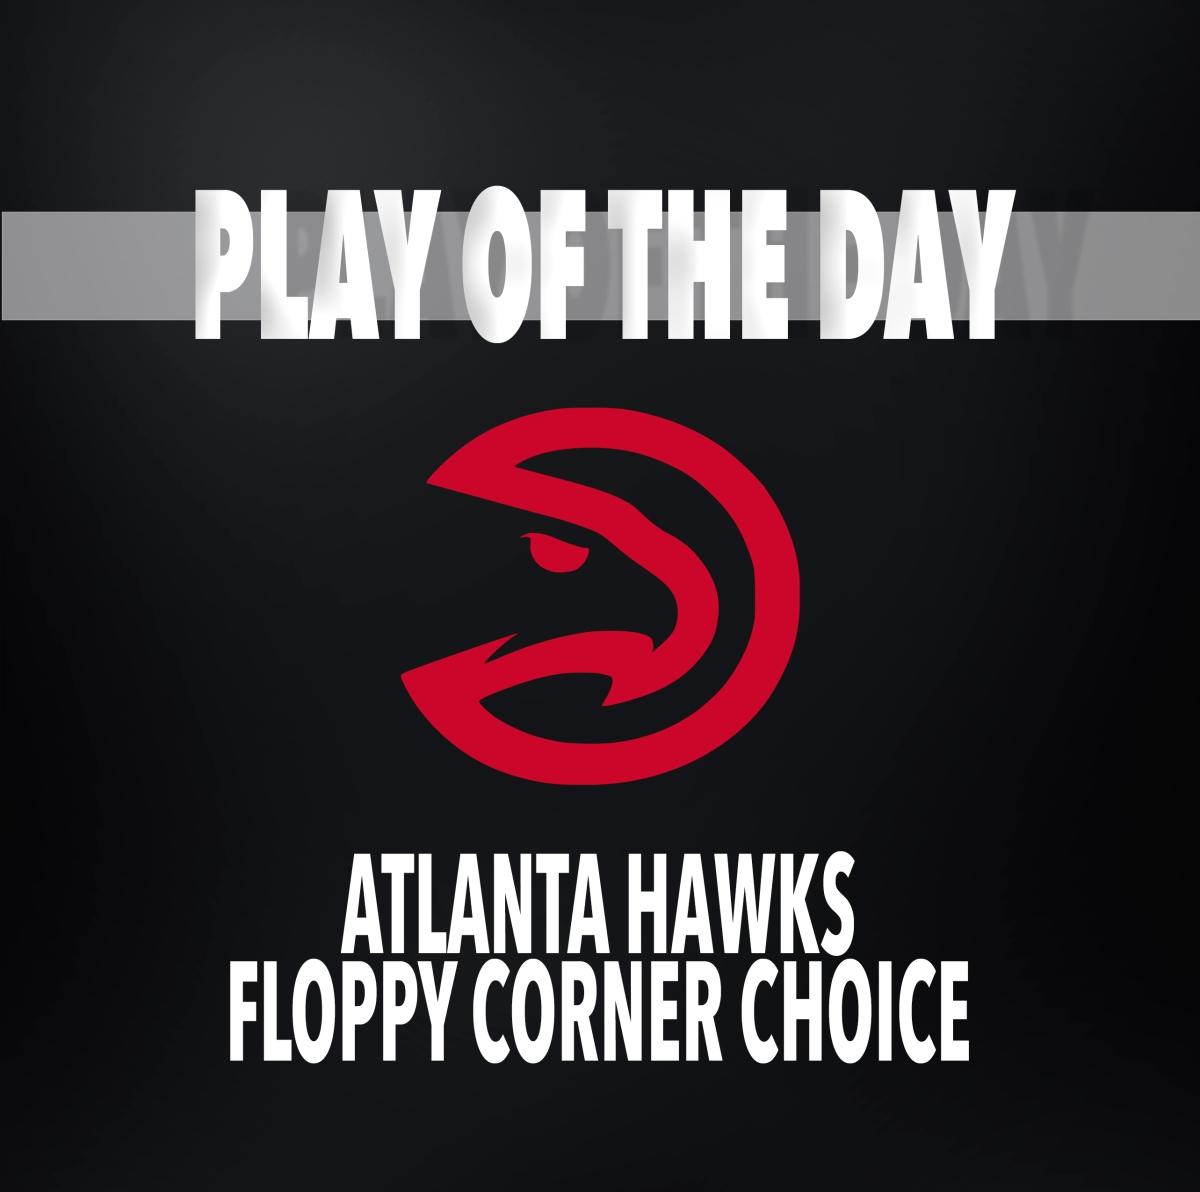 Atlanta Hawks | Man Offense - Floppy - Corner - Choice